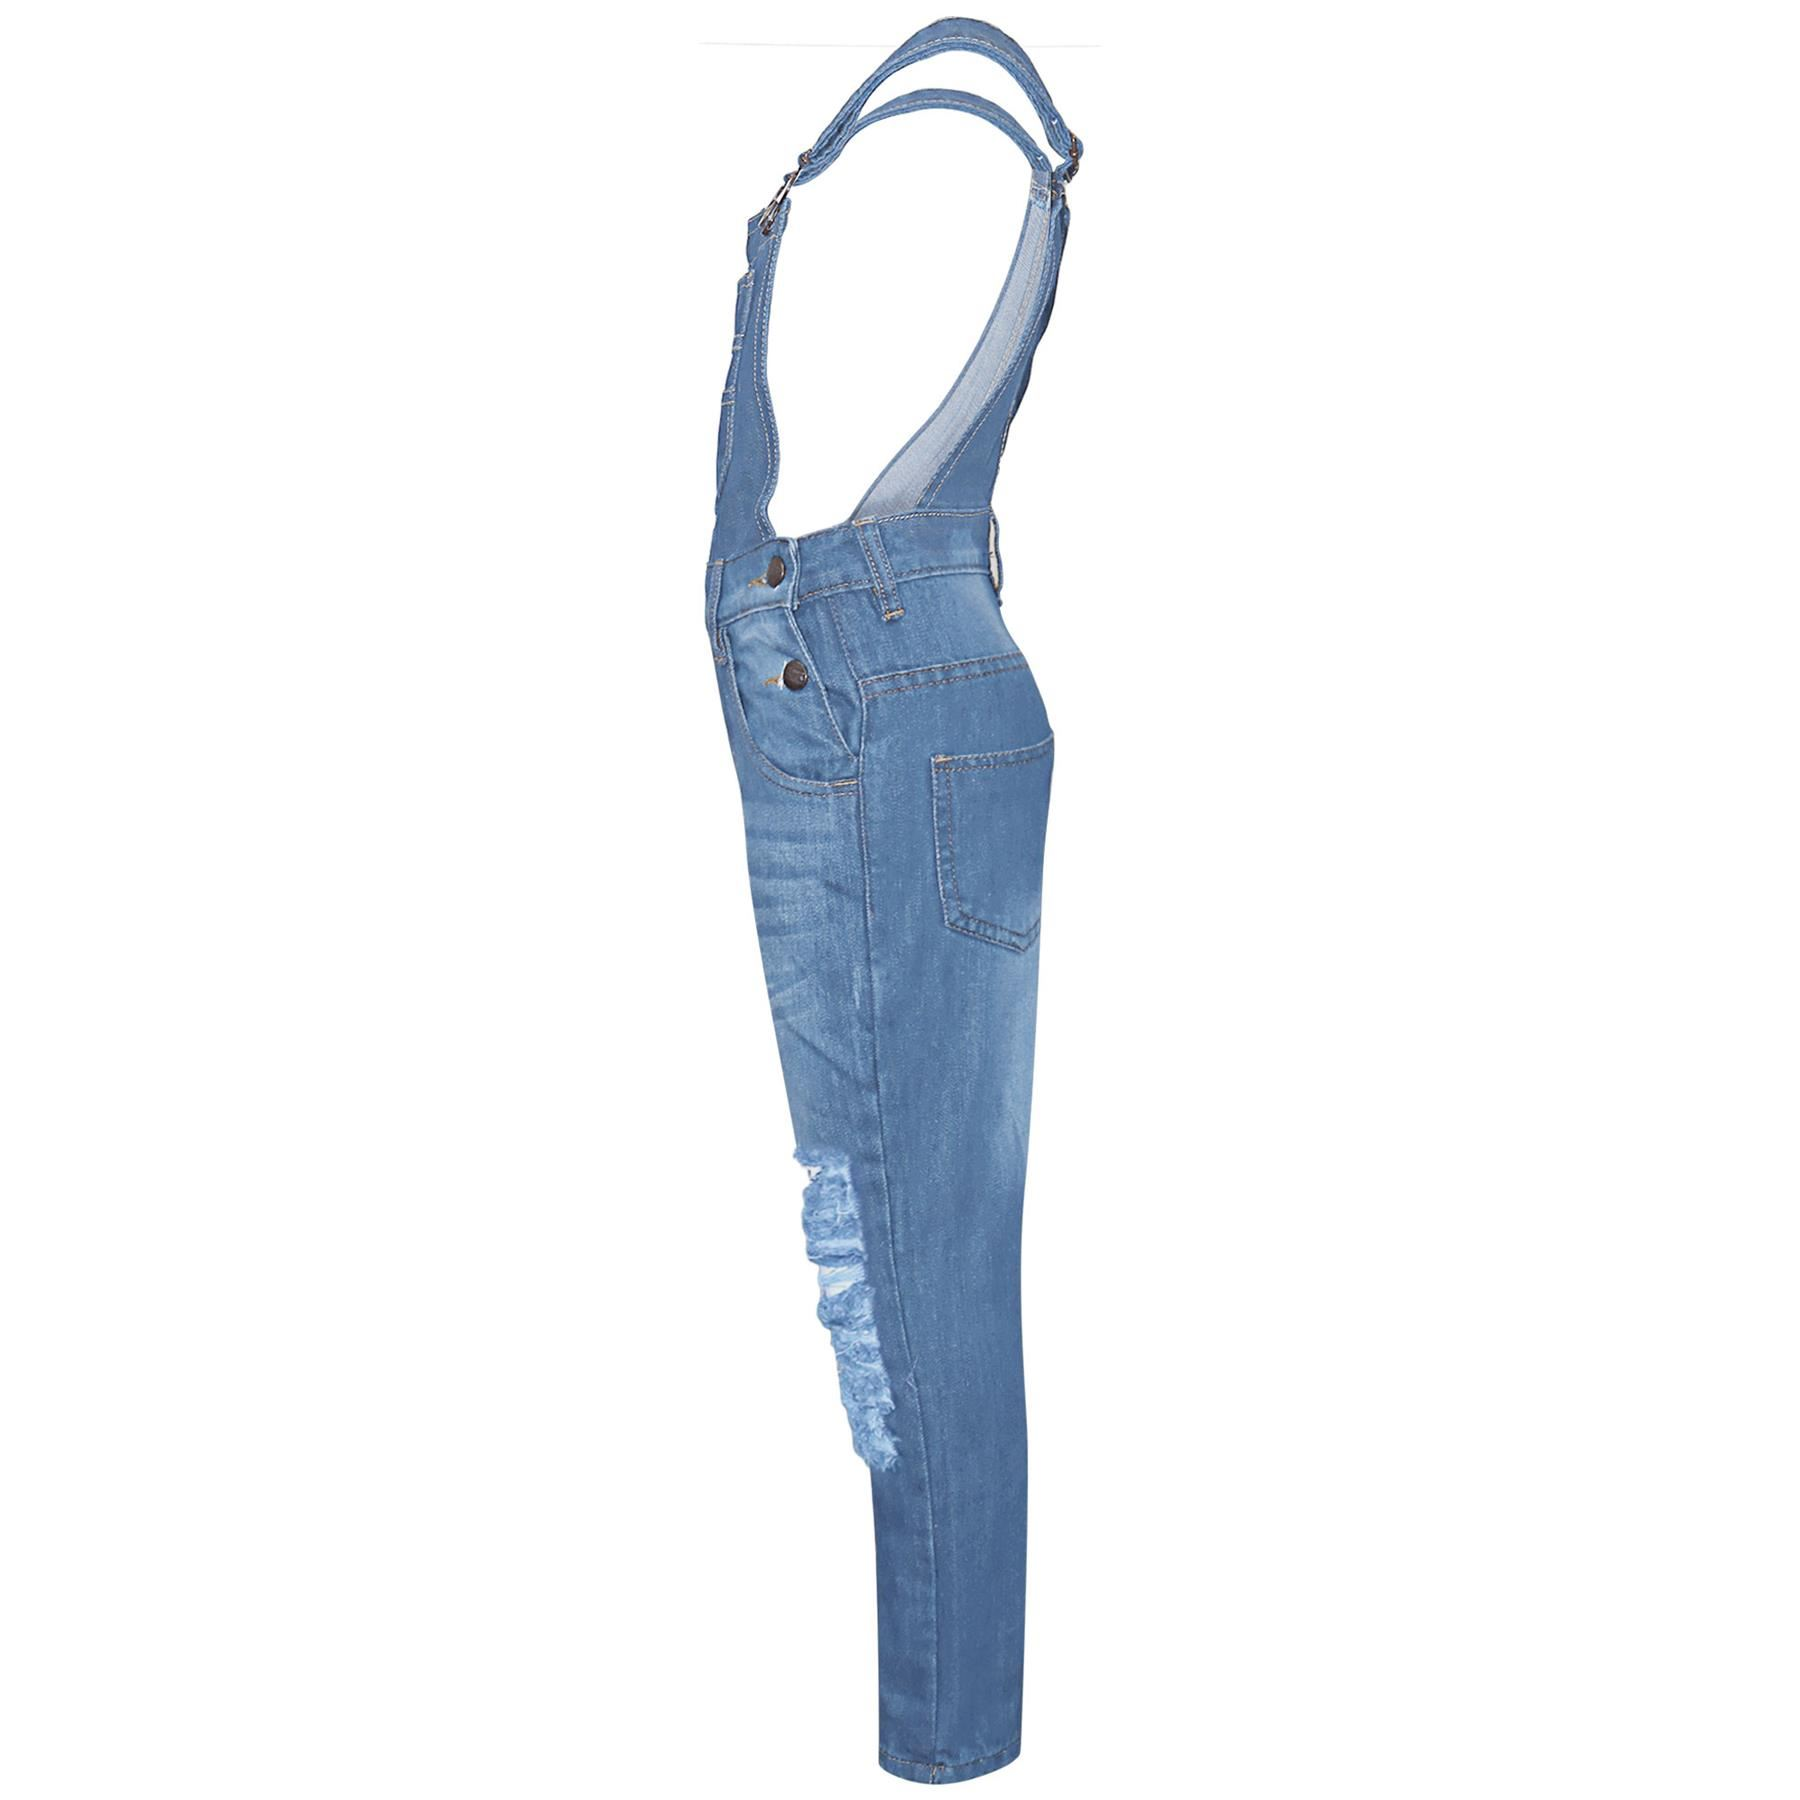 Indexbild 5 - Kinder Mädchen Denim Latzhose Zerrissen Hellblau Jeans Overall Mode Overall 5-13